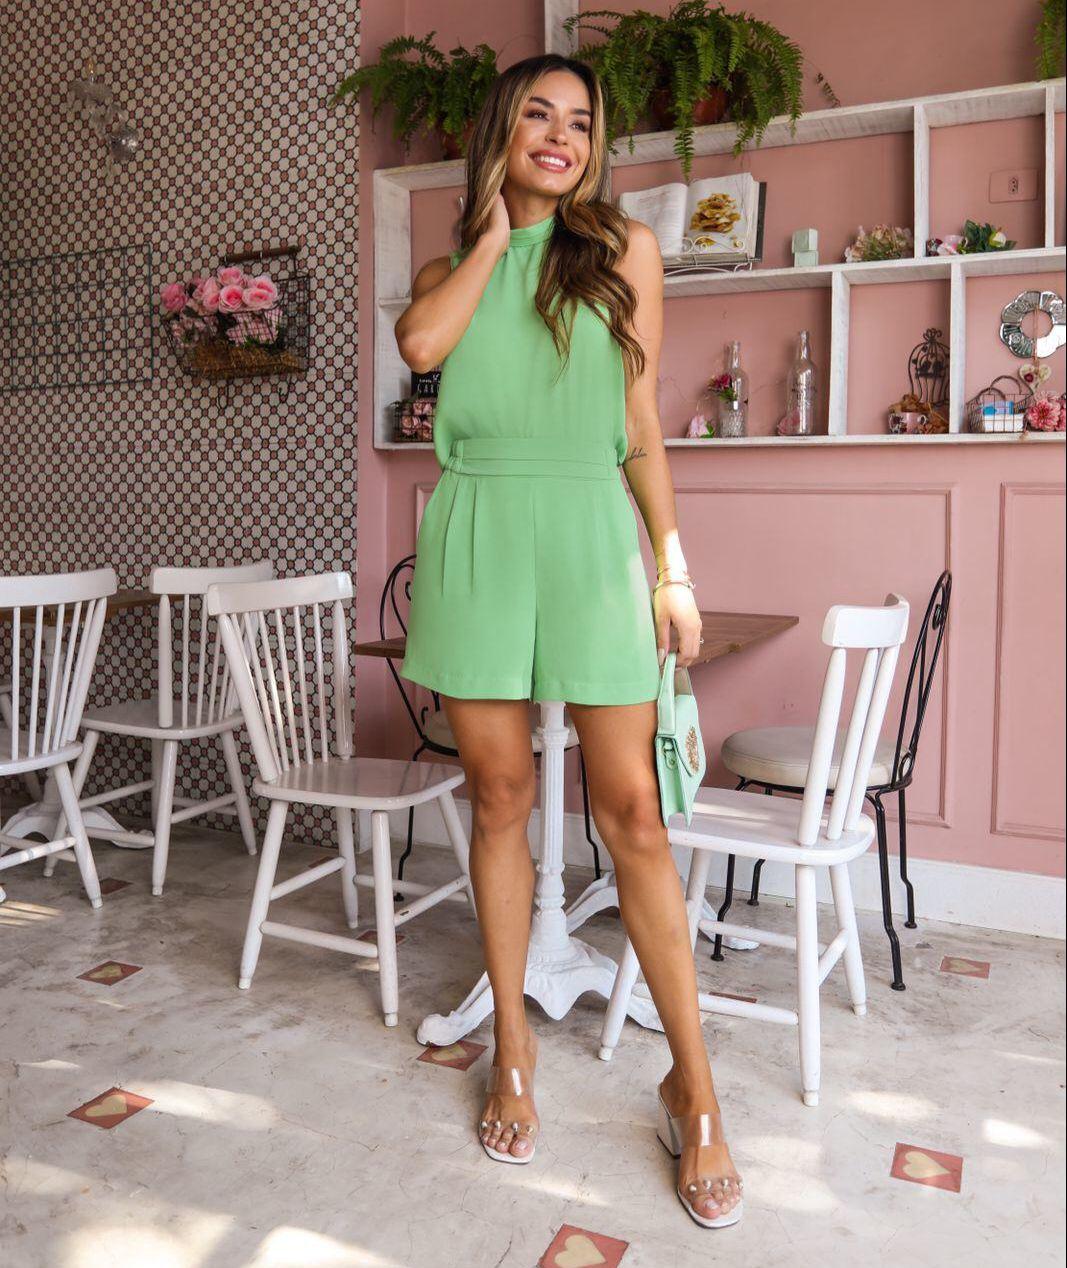 Shorts Cassia Crepe Twill (Forro) Cos Elastico Detalhe Pregas